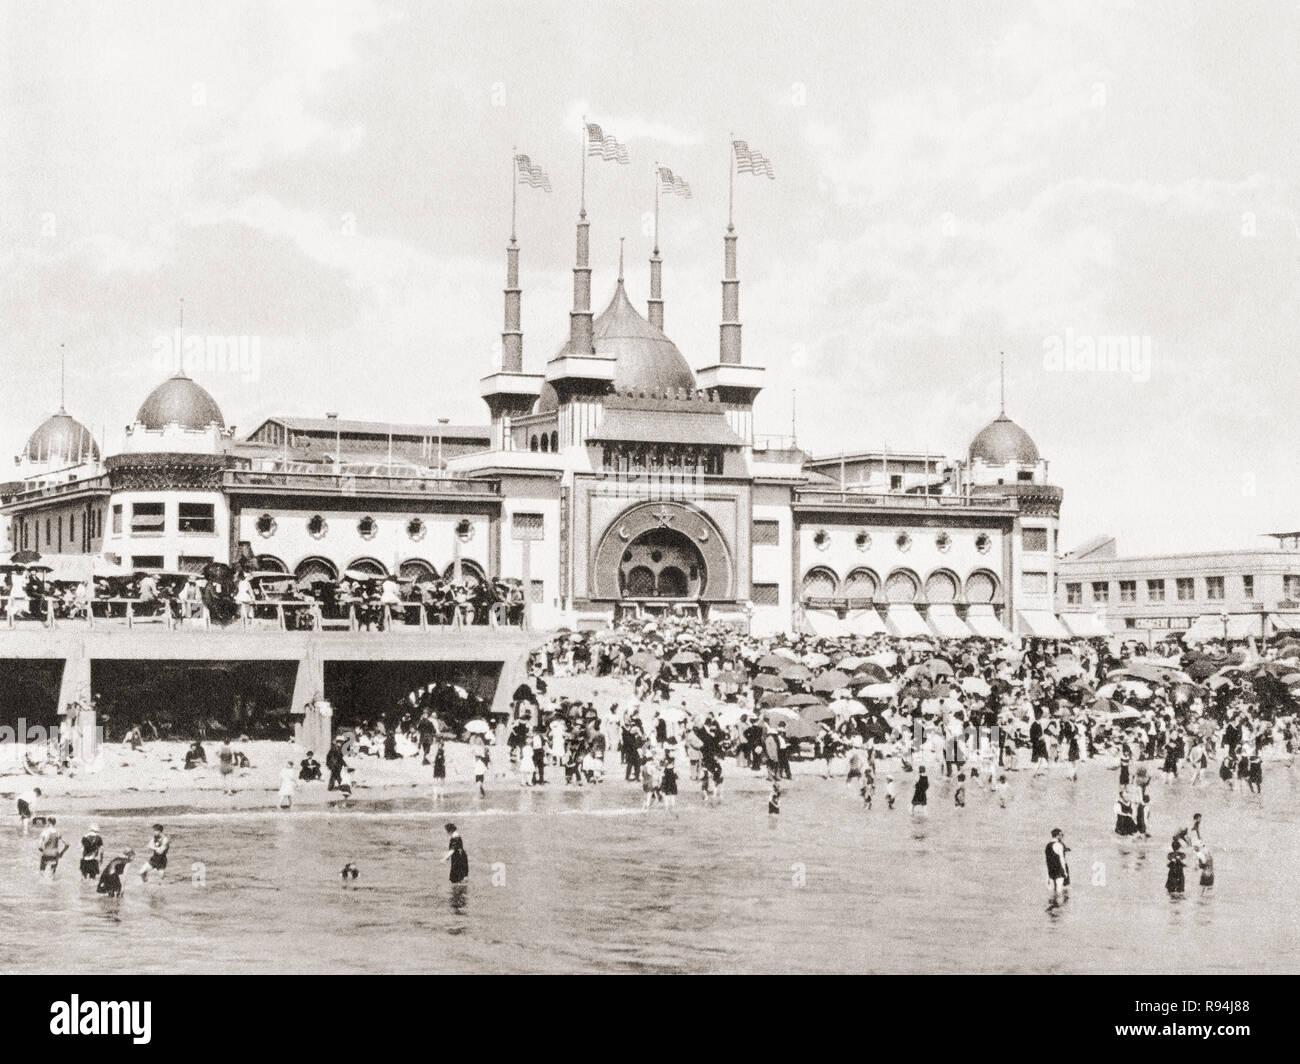 The Natatorium, Ocean Park, Los Angeles, California, United States of America, c. 1915.  From Wonderful California, published 1915. - Stock Image